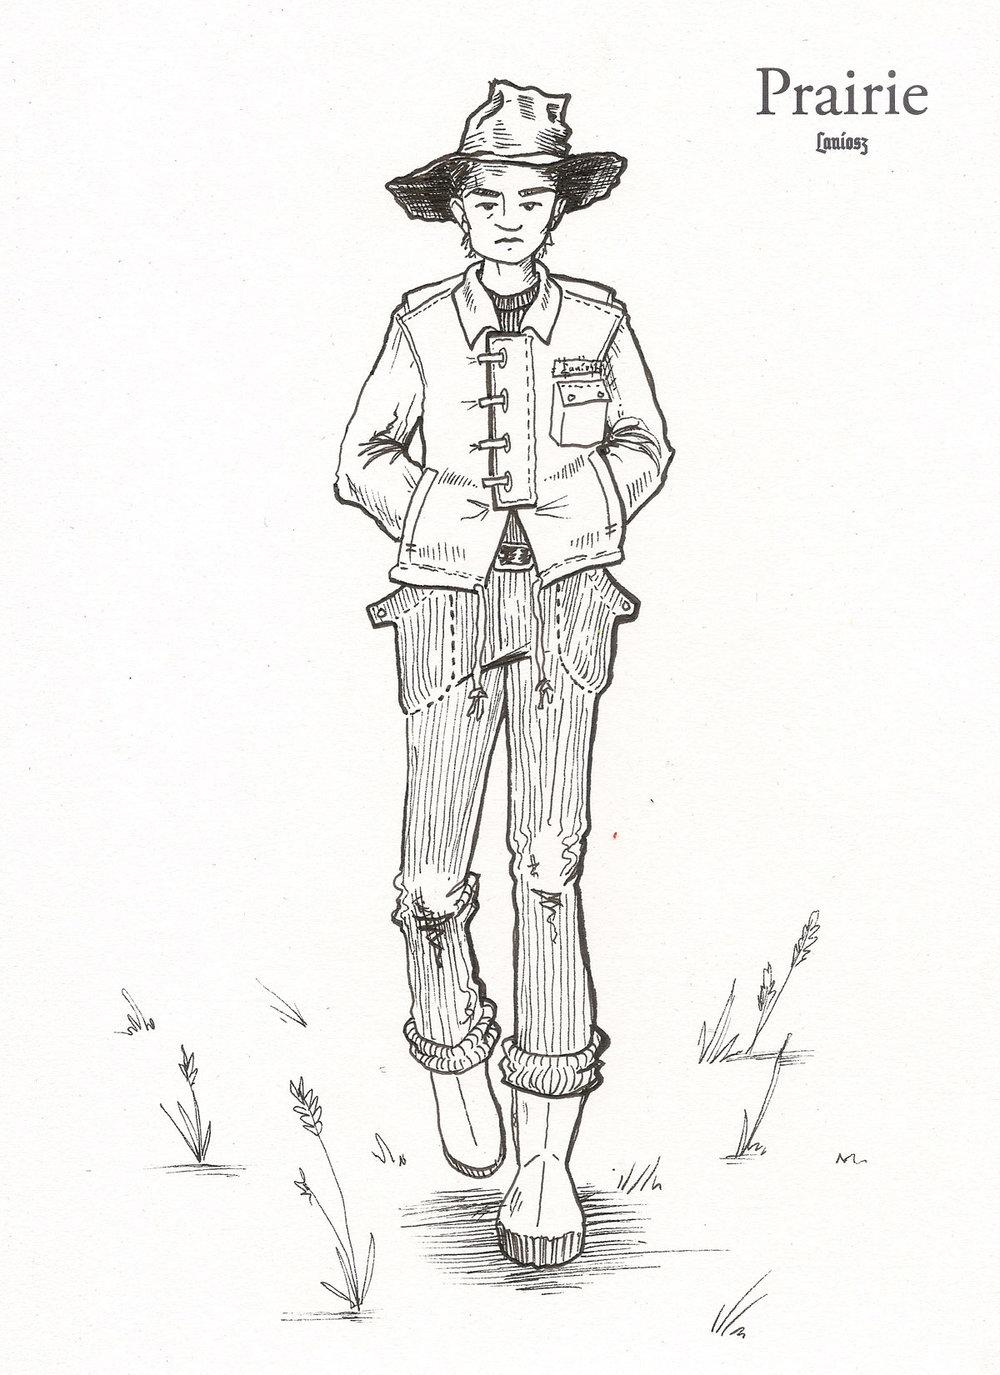 laniosz-prairie-sketch-4.jpg